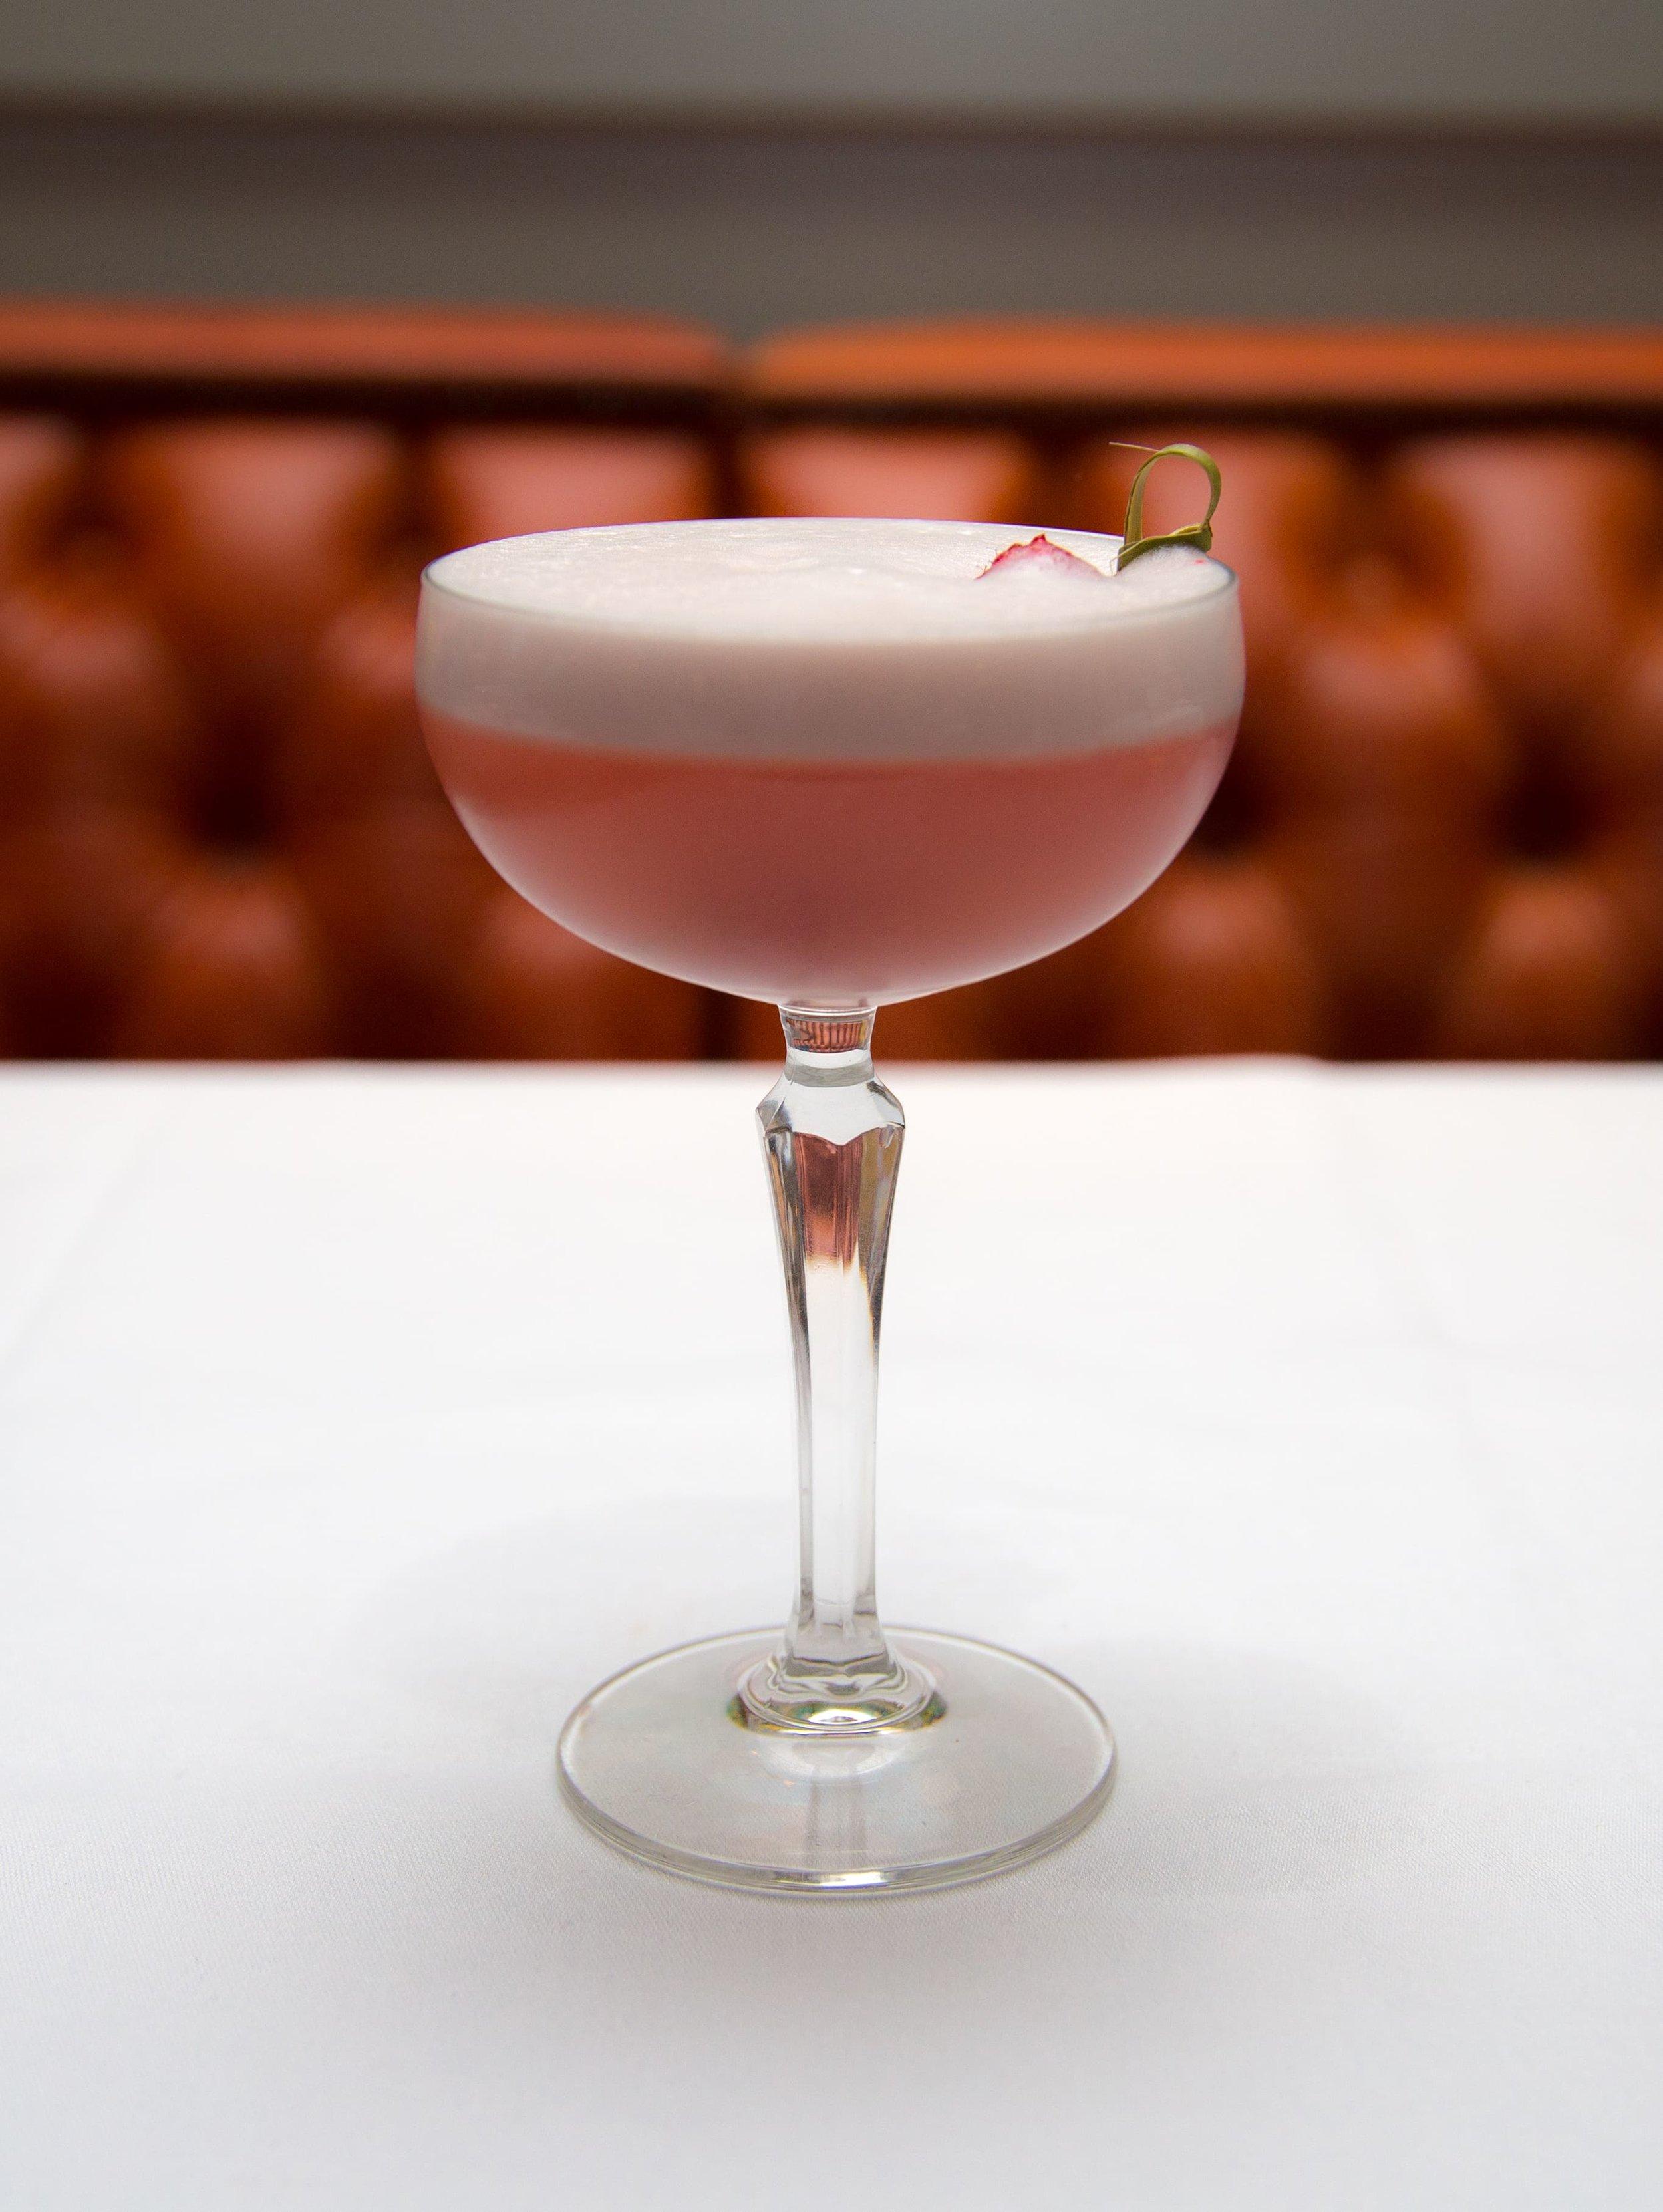 Clover Queen cocktail – Boadicea Rosa gin, lemon juice, raspberry syrup, egg white – garnish with raspberries